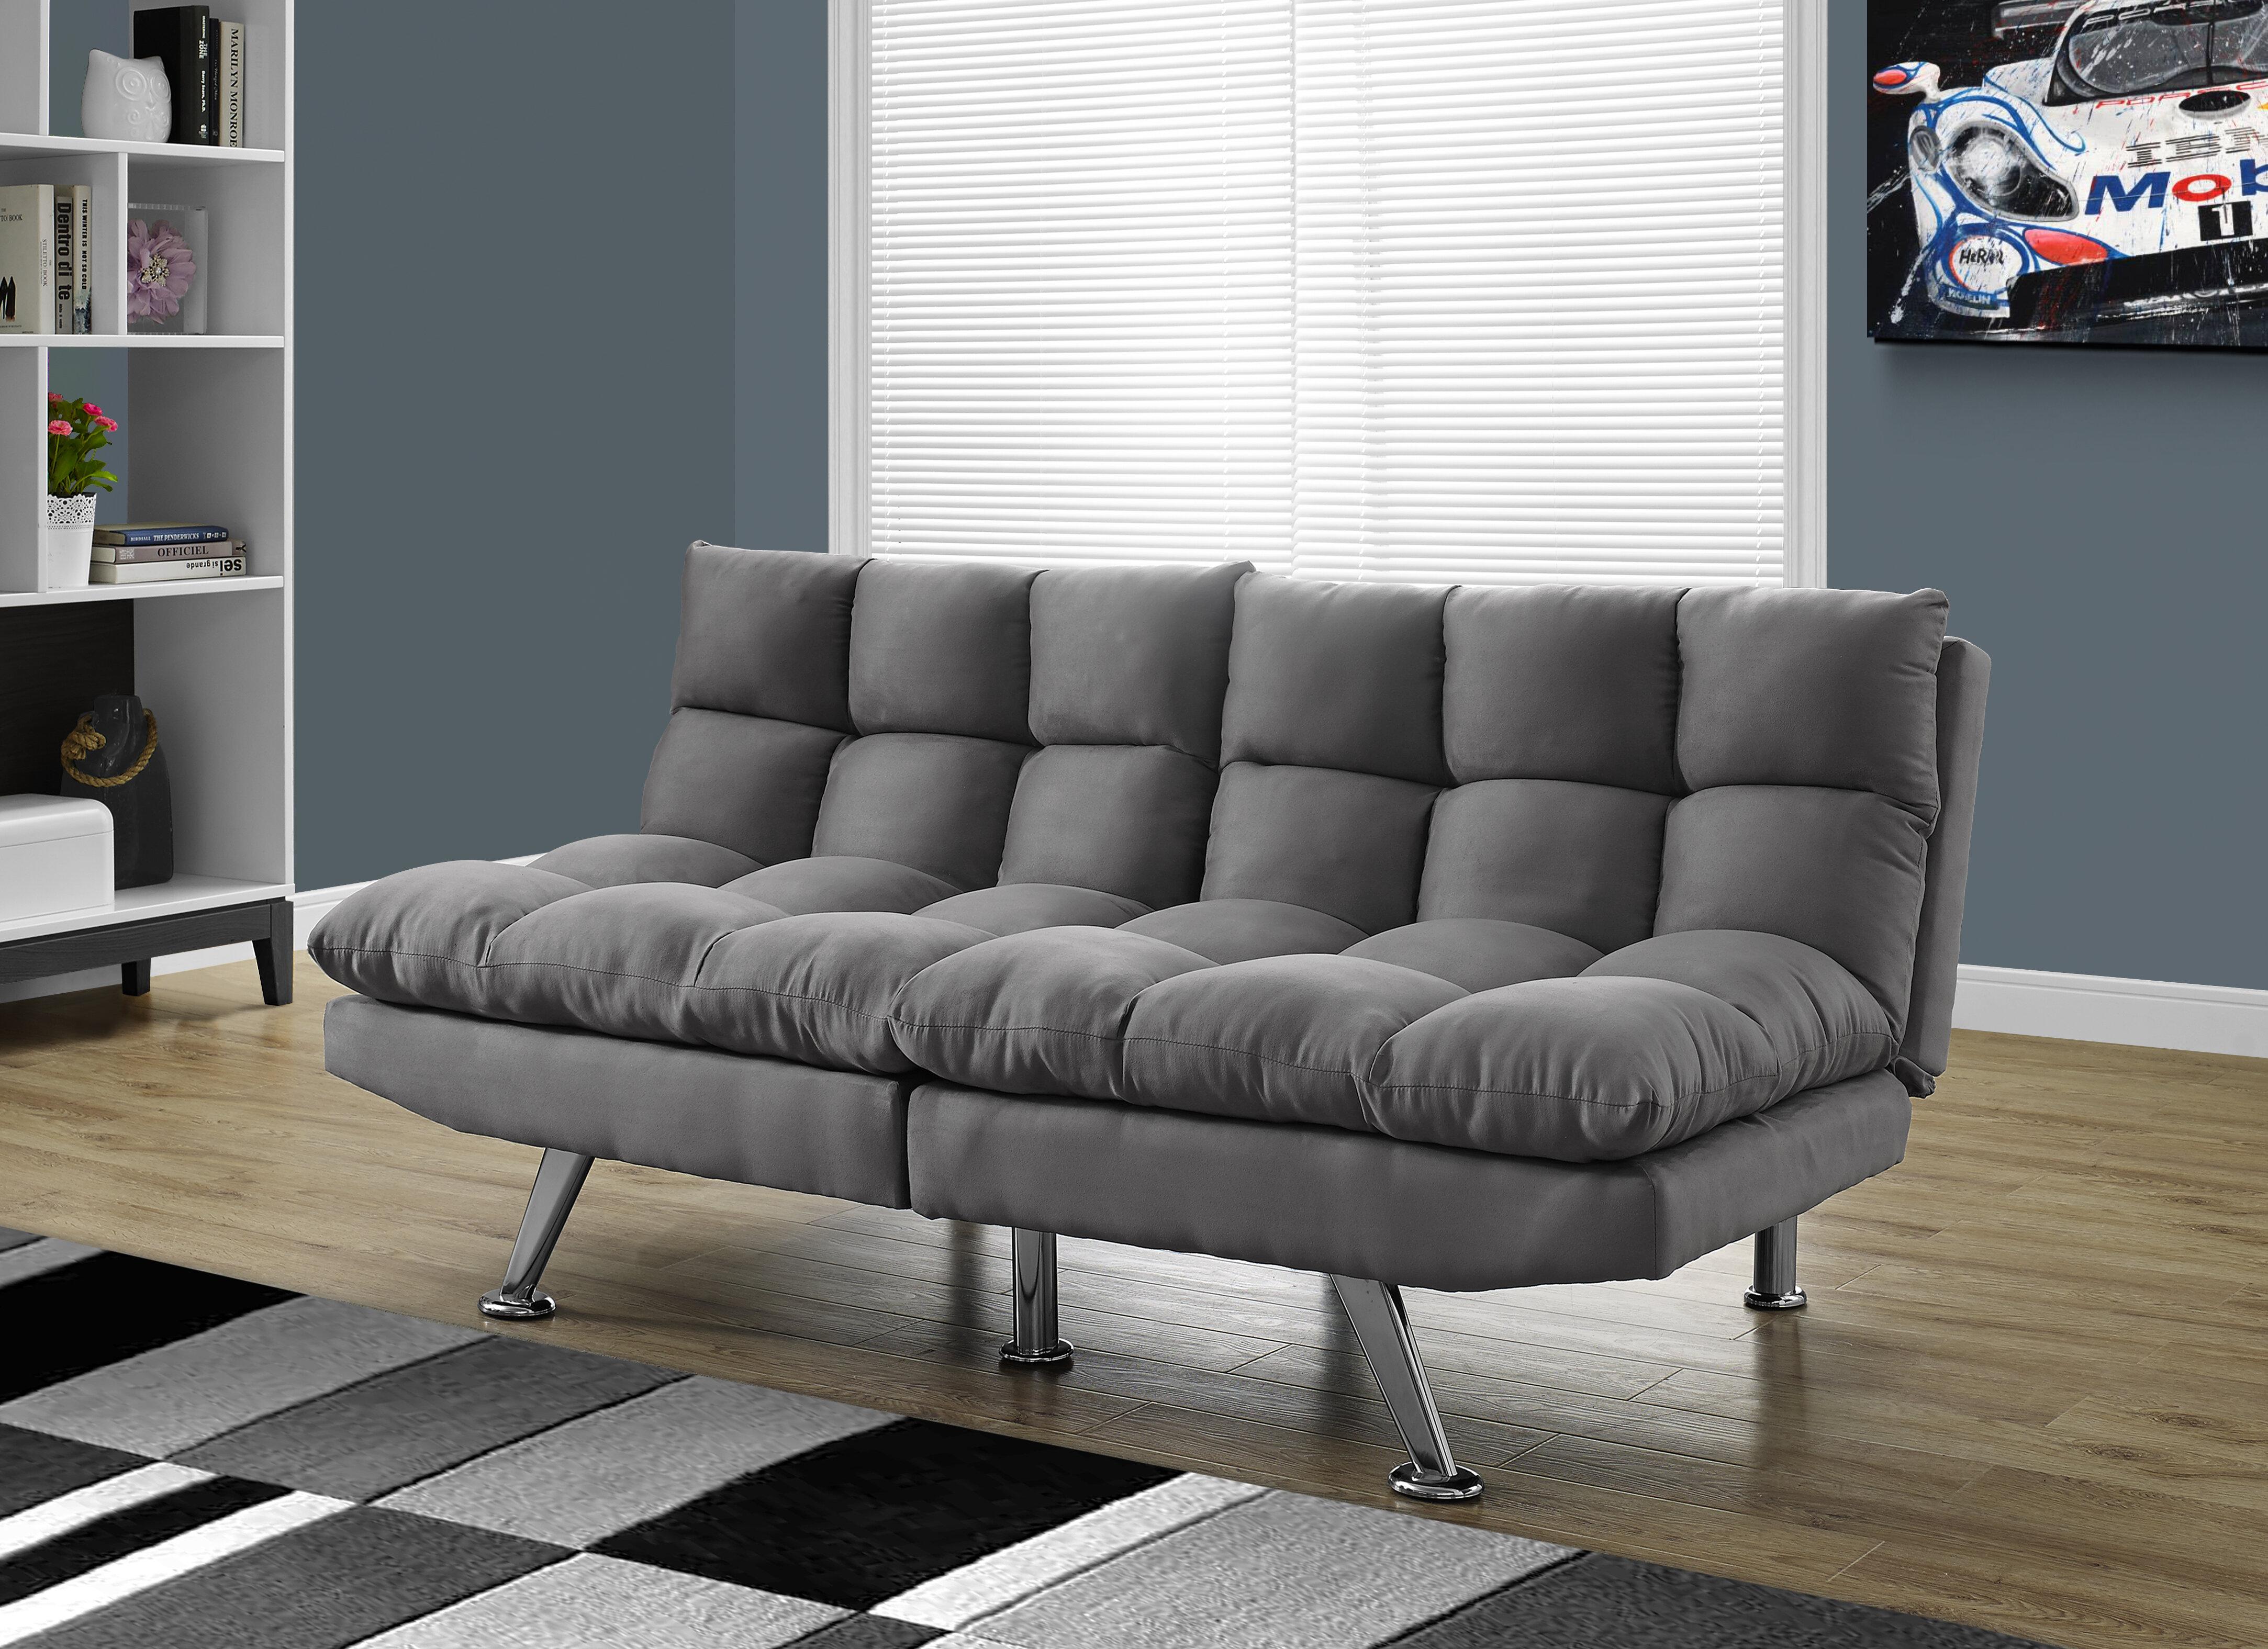 futons couch for ip walmart top allegra pillow futon less black dhp com microfiber plush